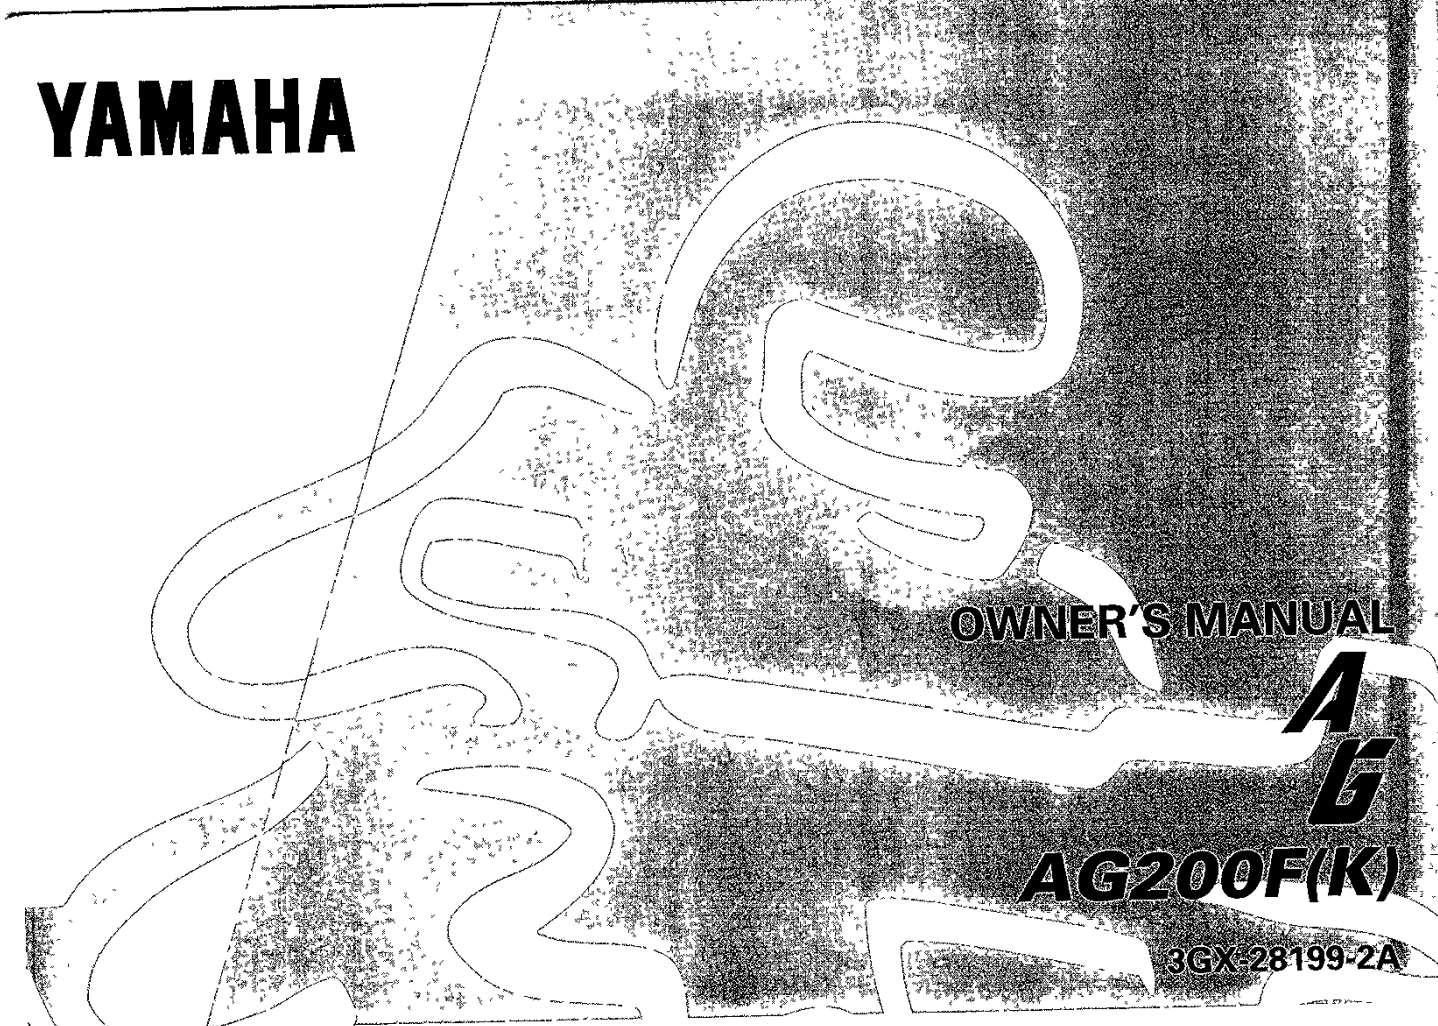 Yamaha AG200F K 1998 Owner's Manual